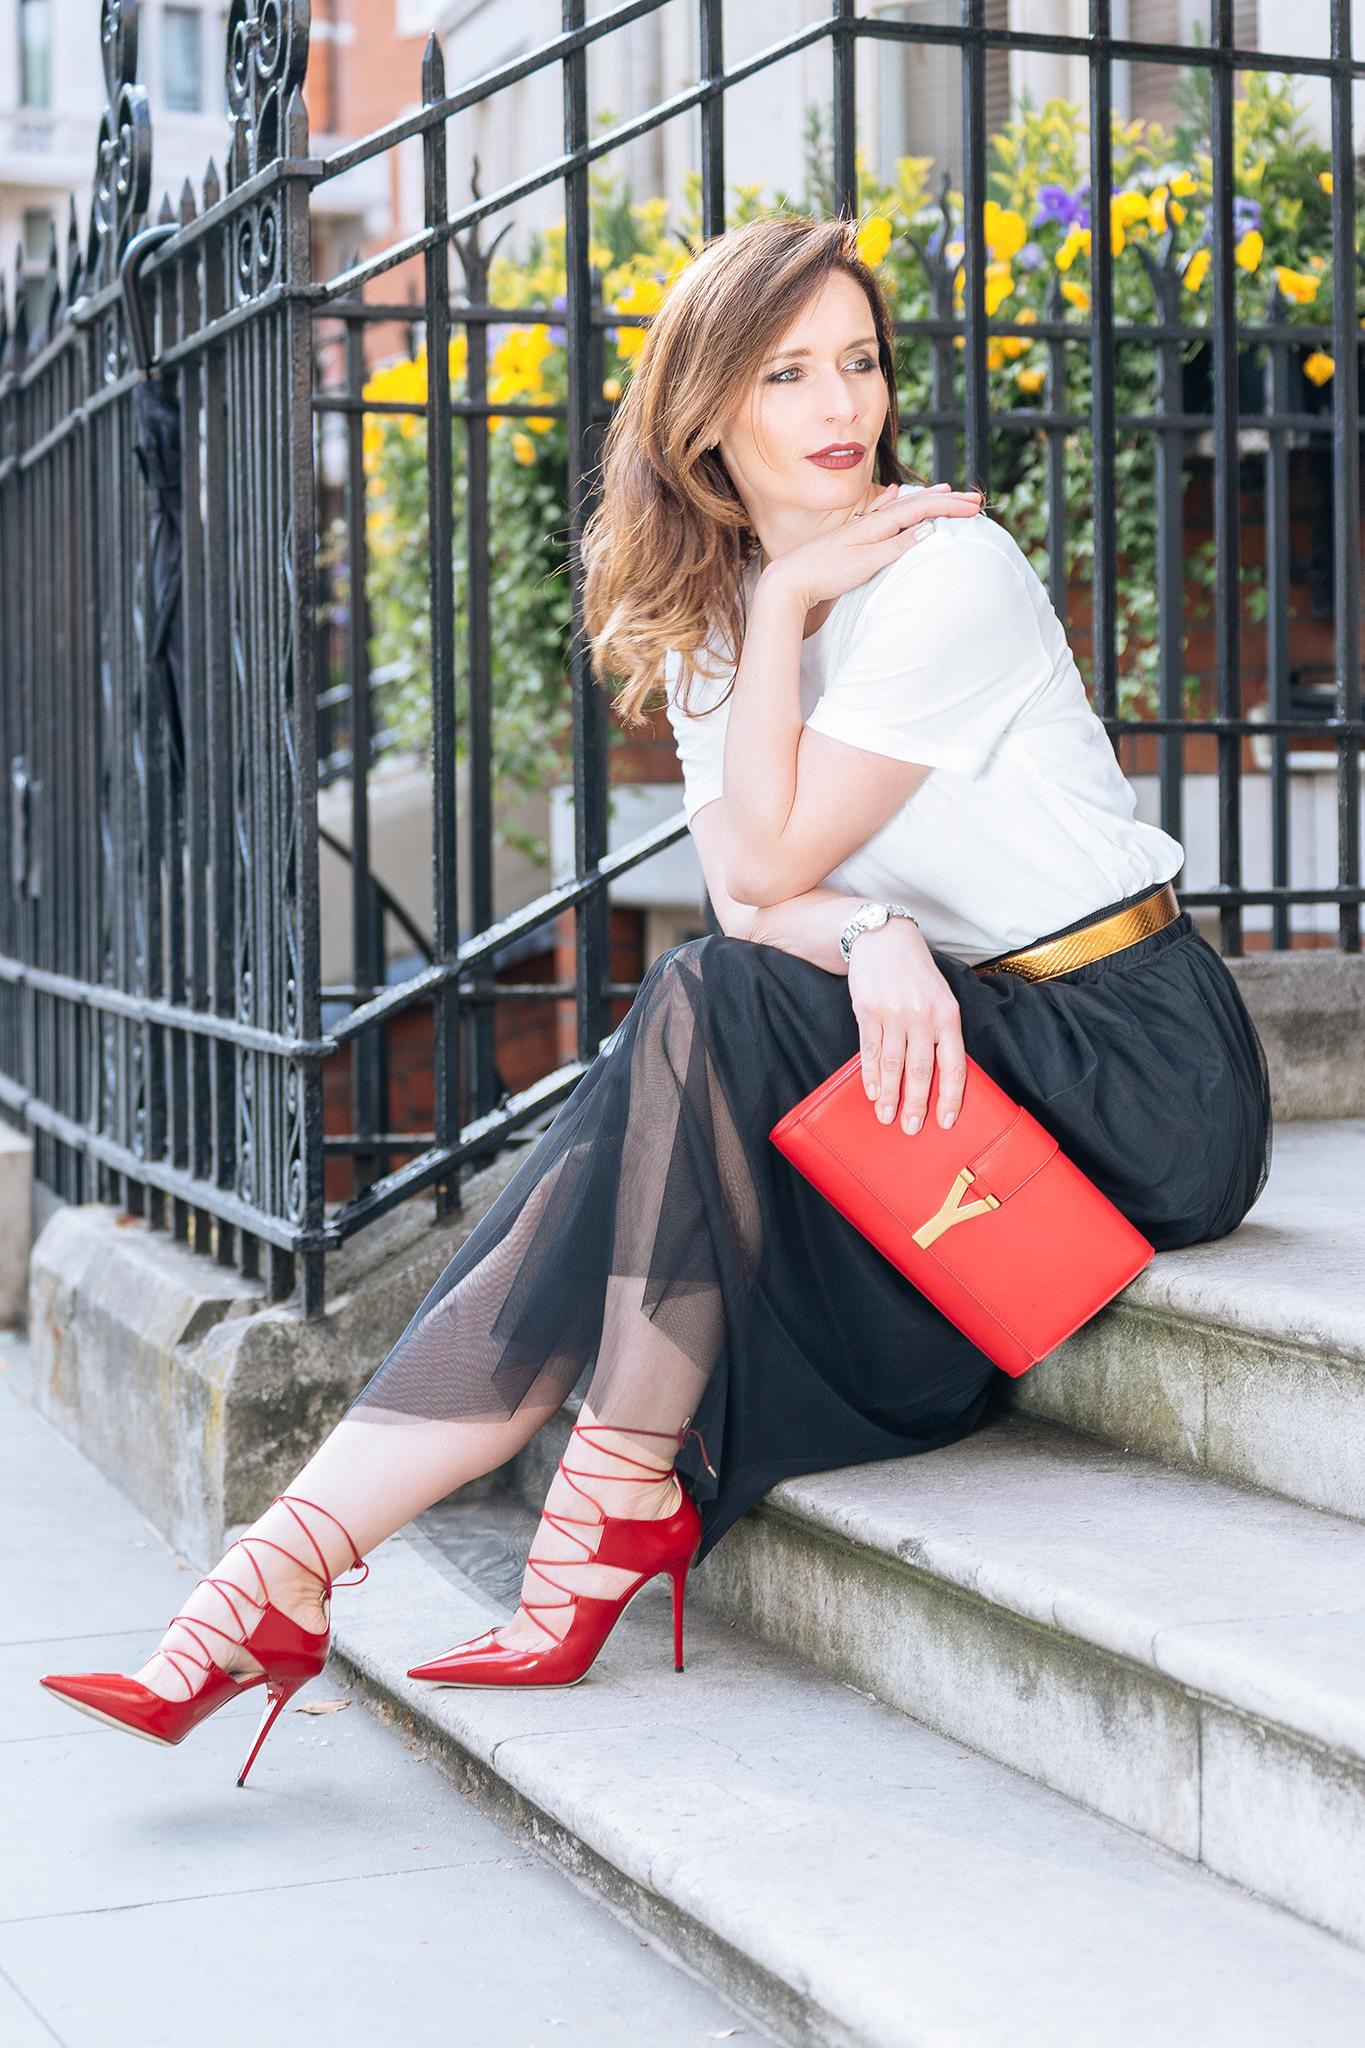 black tulle skirt, red Jimmy Choo heels